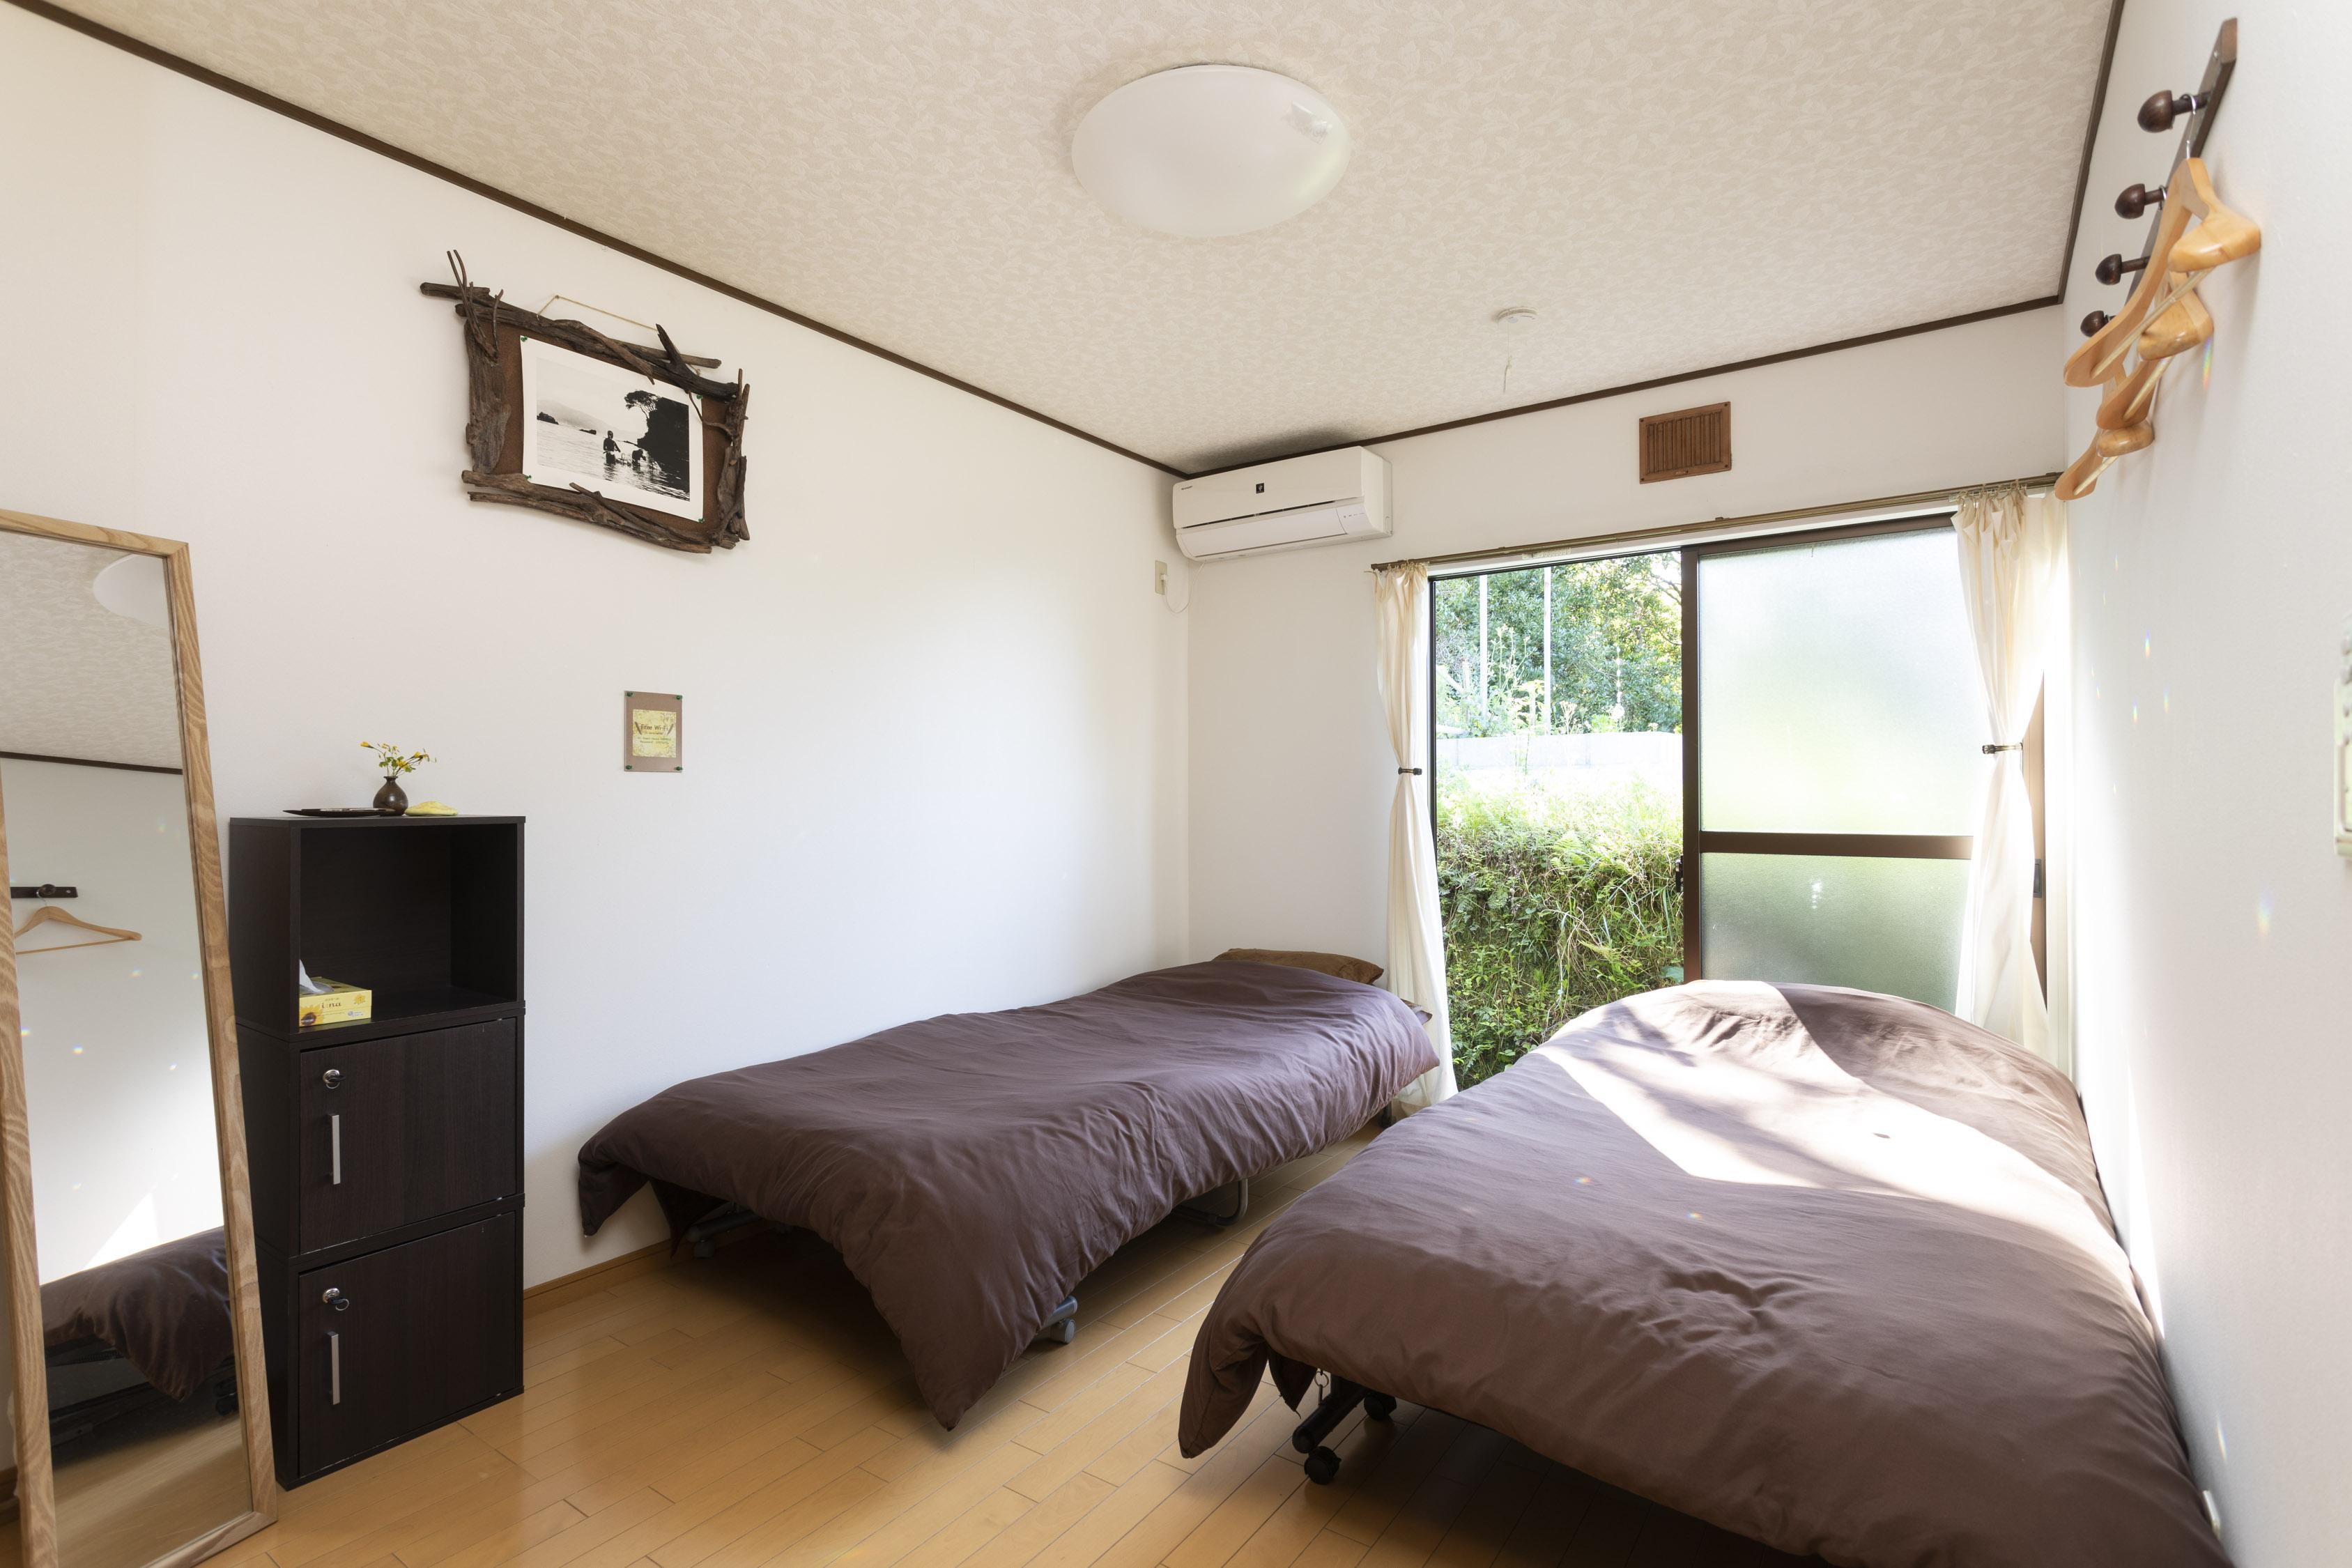 Room 2 (West)